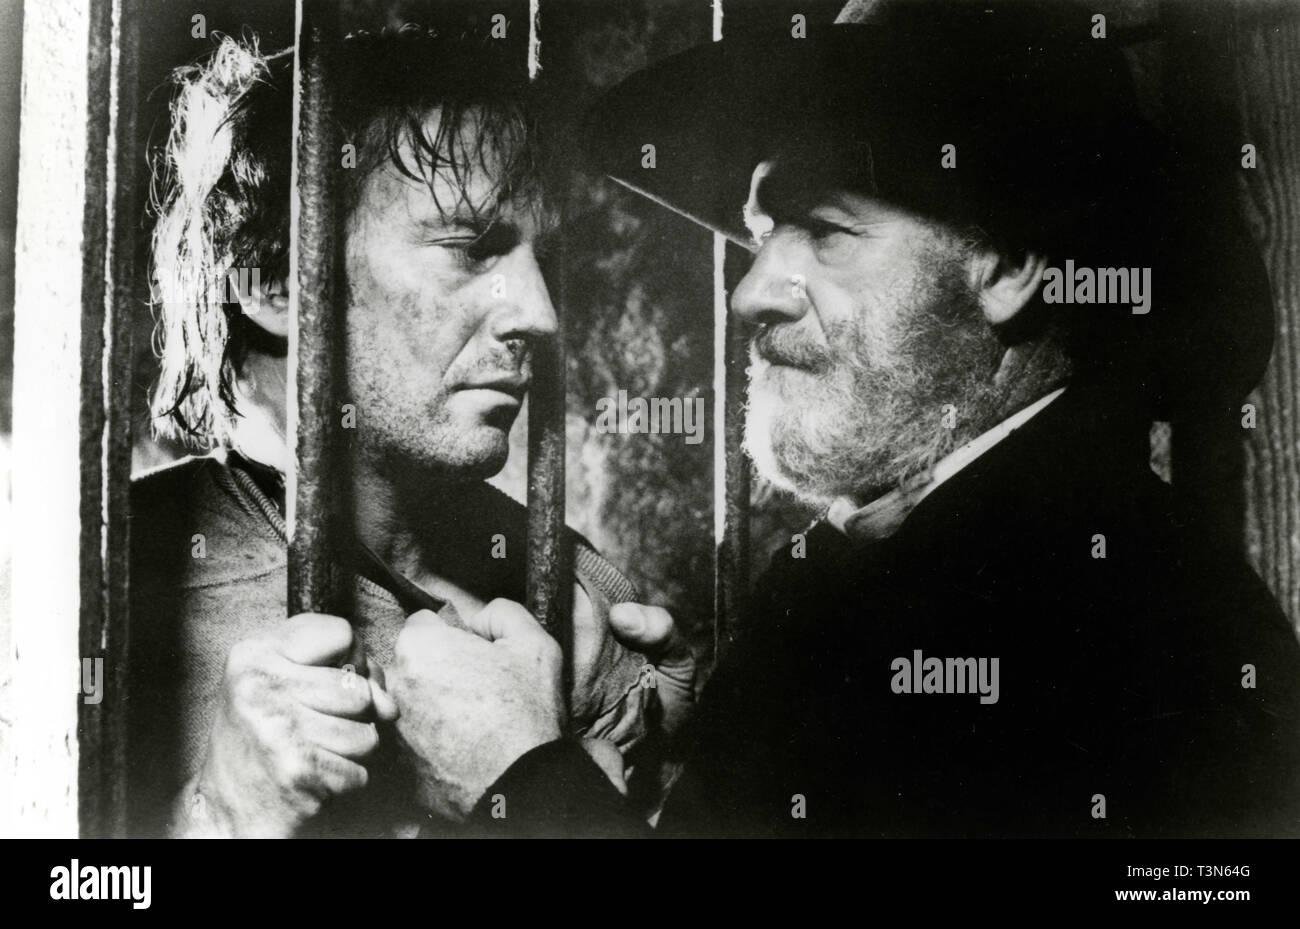 Actors Kevin Kostner and Gene Hackman in the movie Wyatt Earp, 1994 - Stock Image